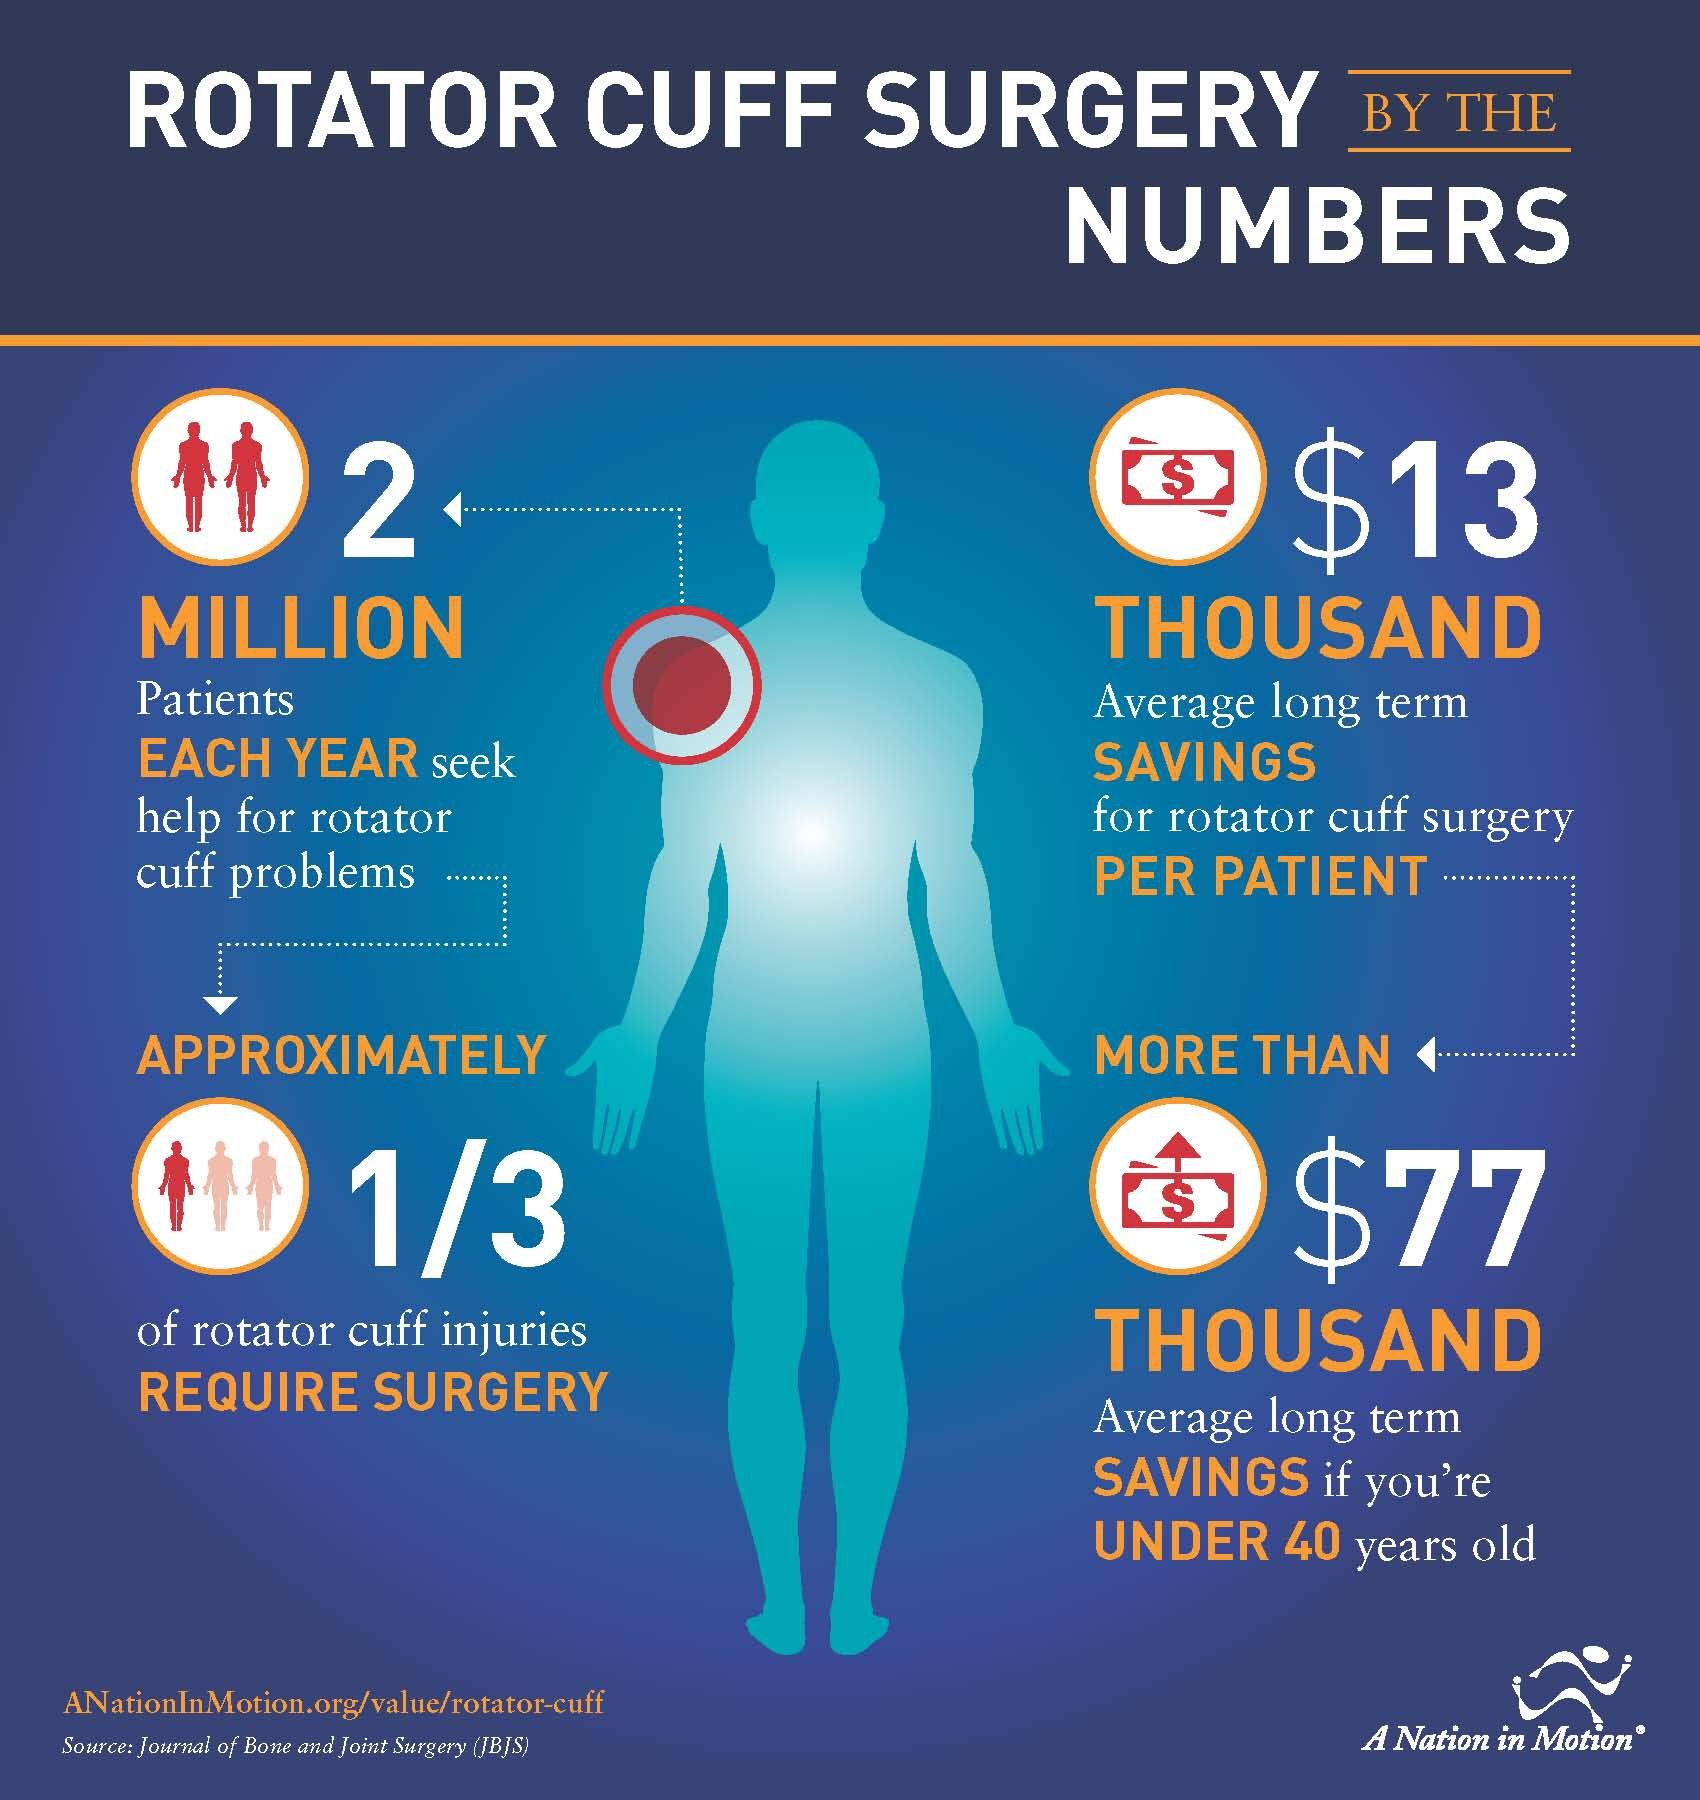 Rotator Cuff Surgery by the Numbers Rotator cuff